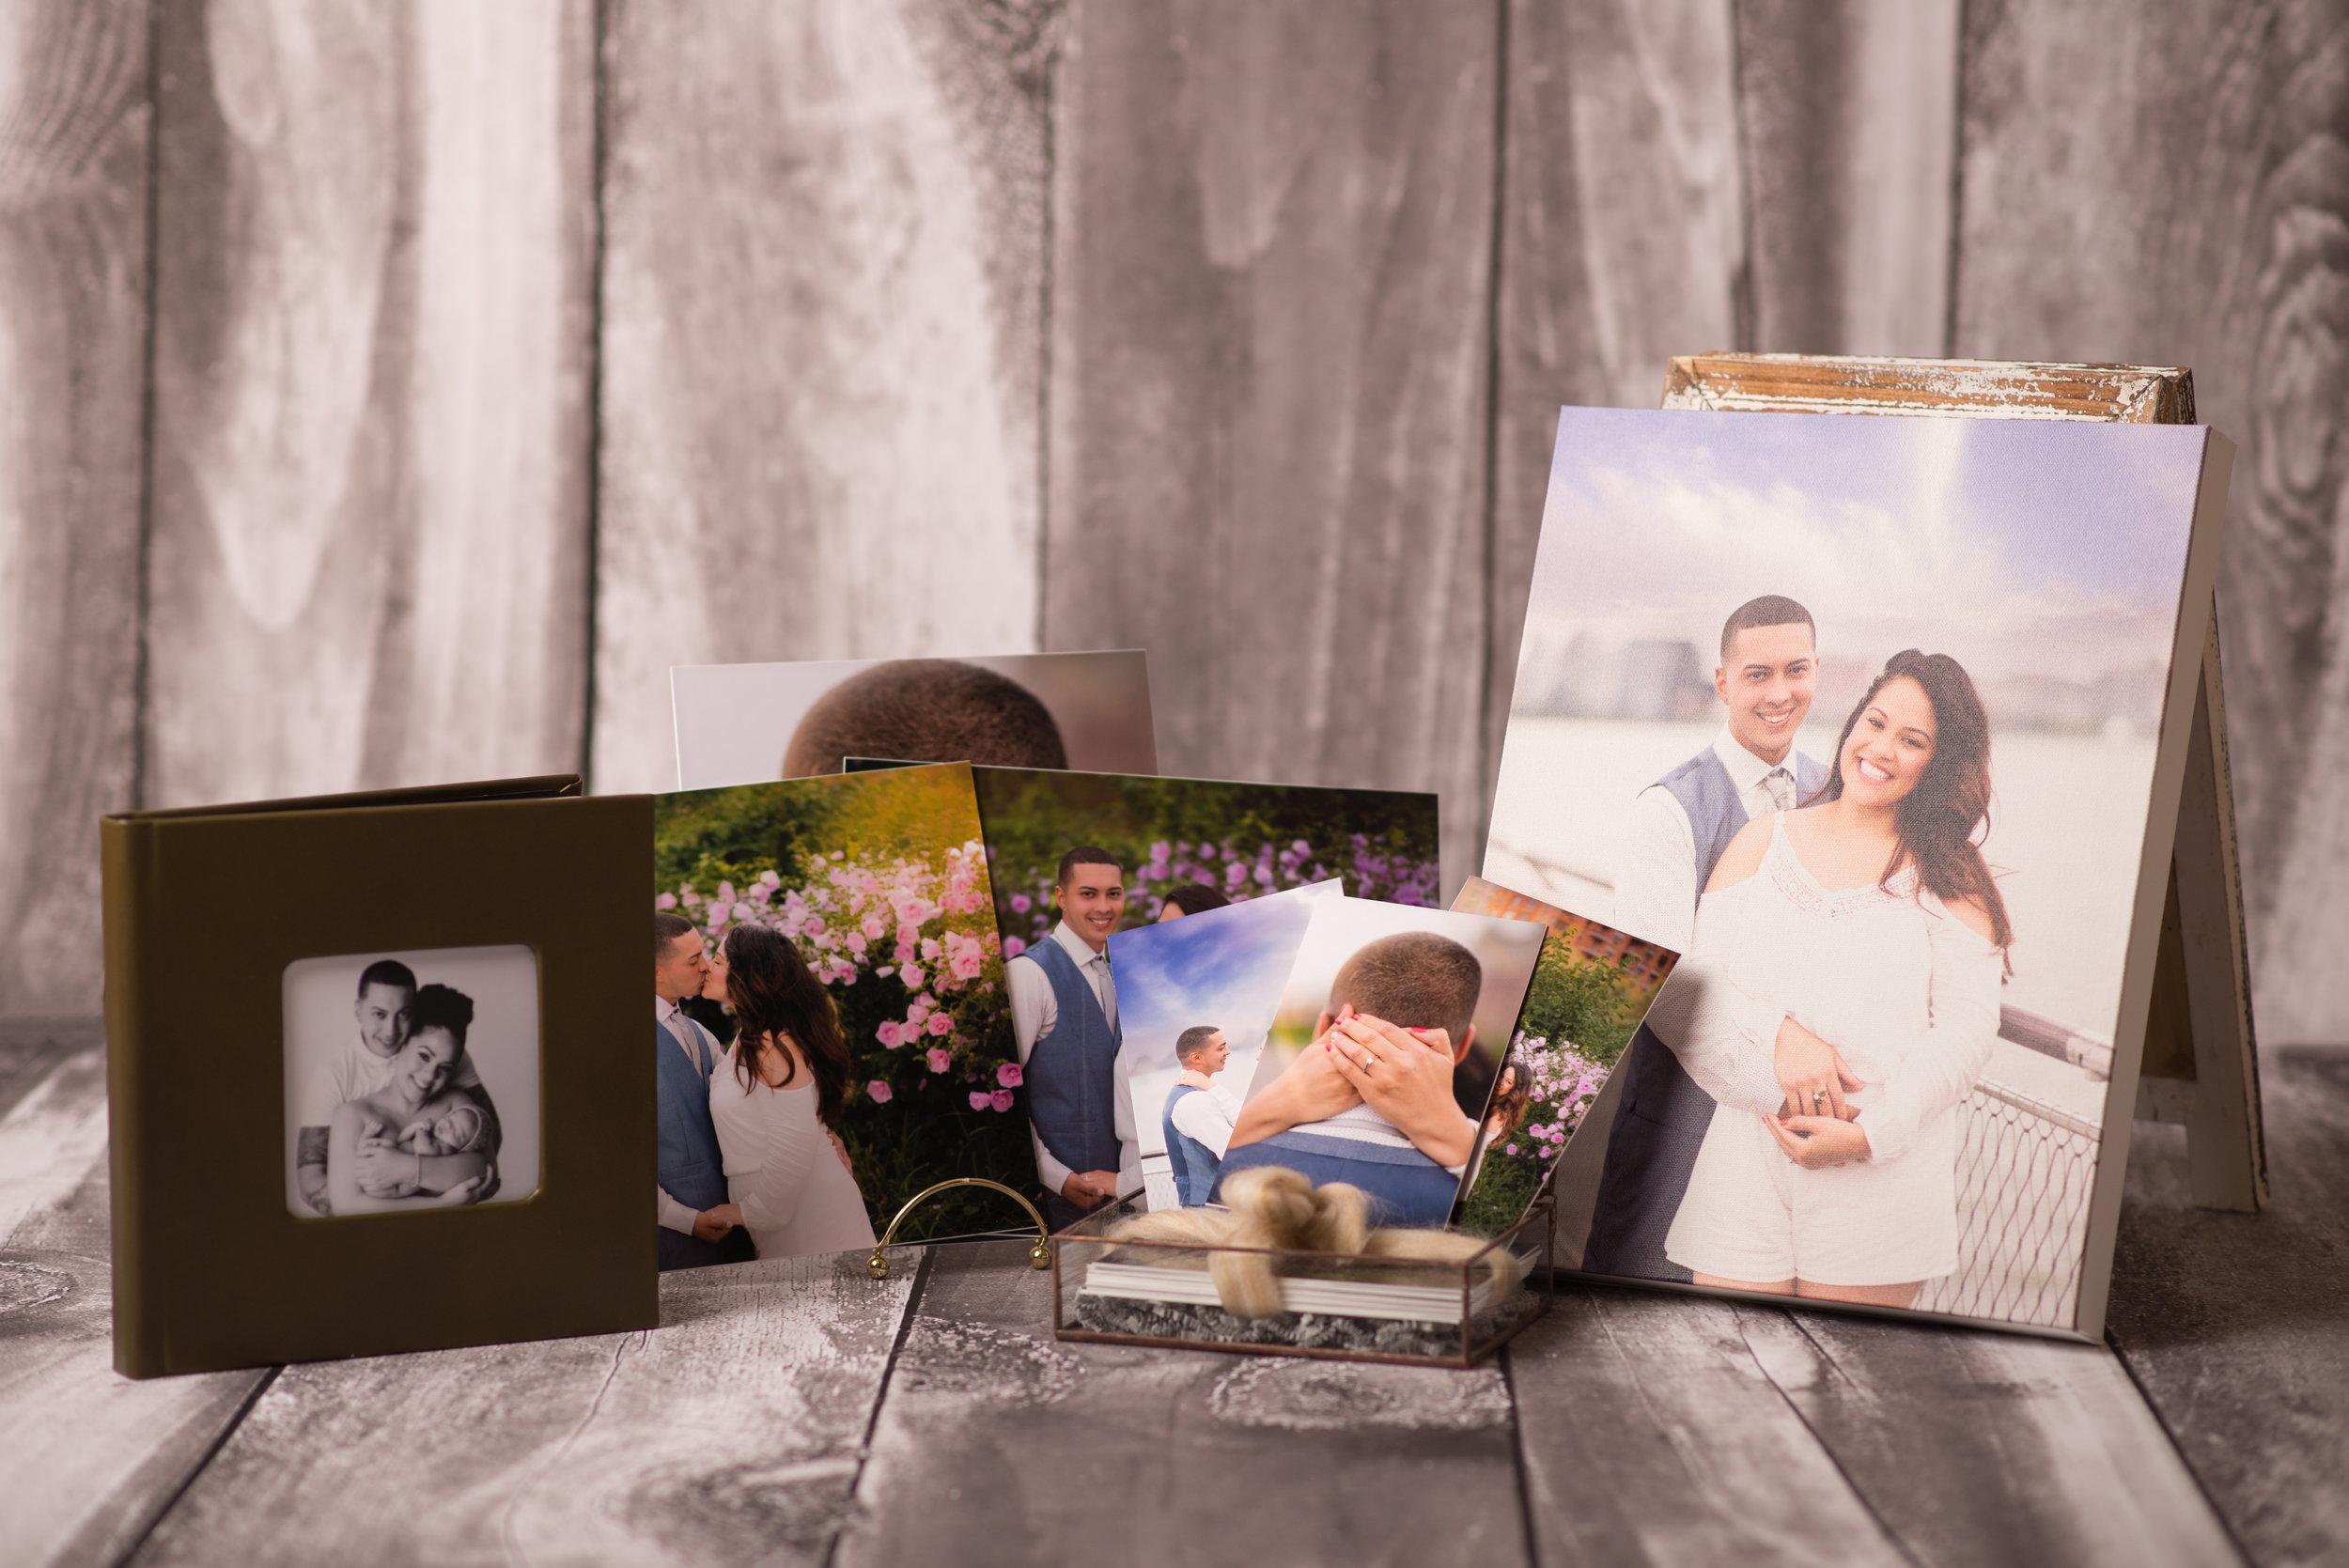 Jennifer Zuniga- Bump to Birth and Proposal